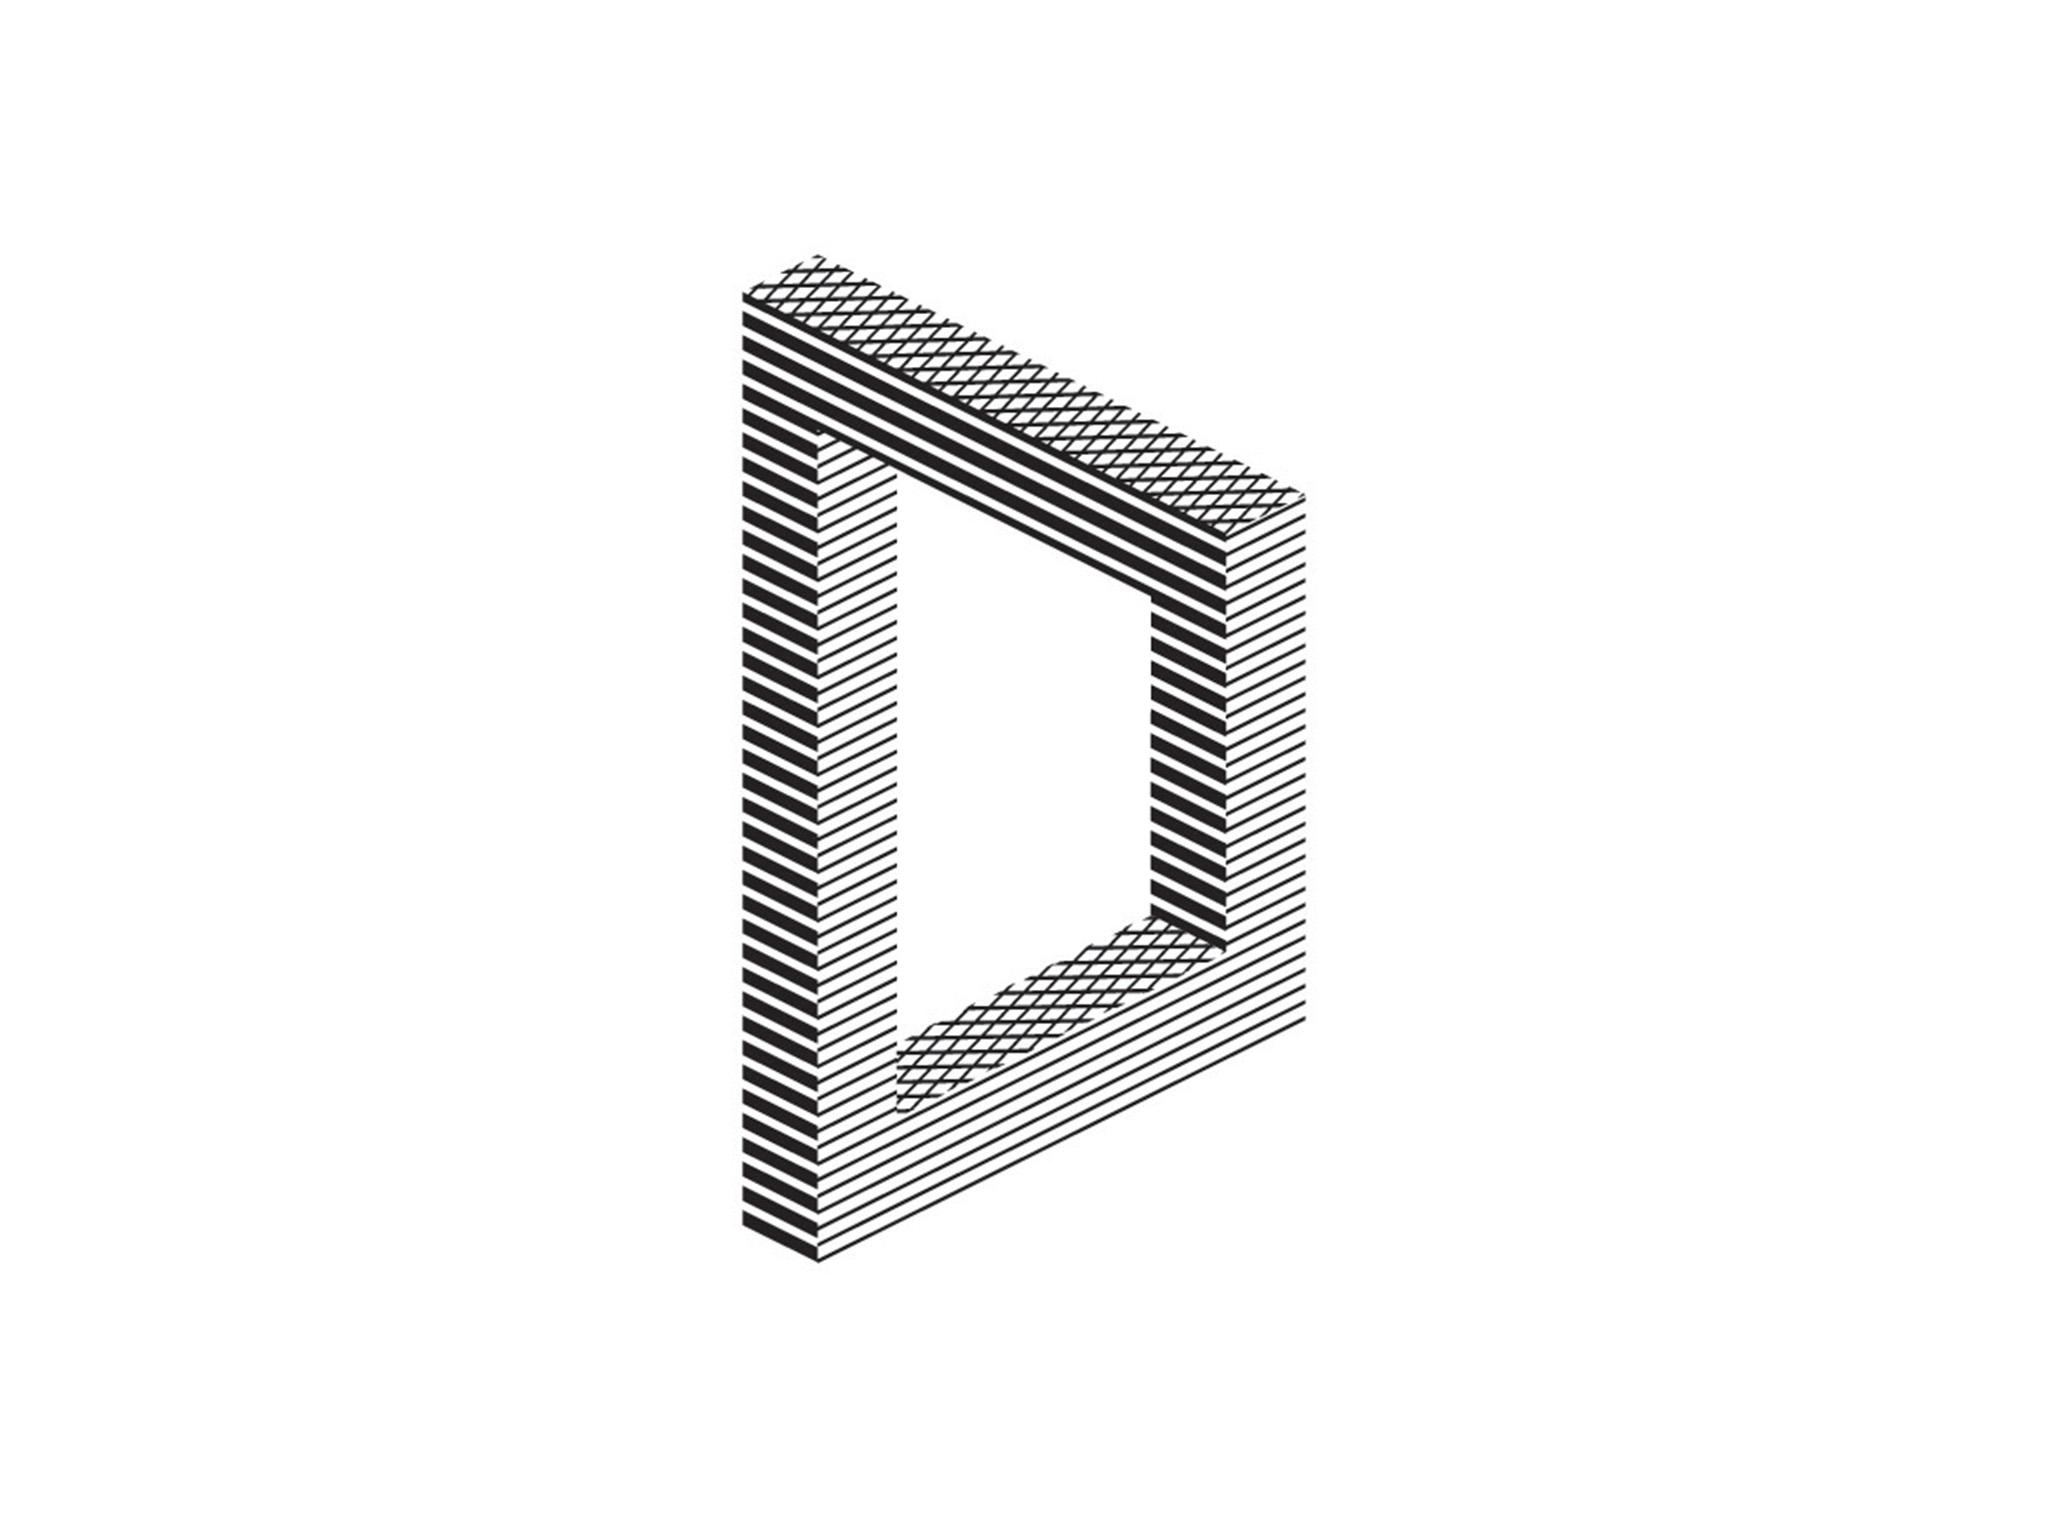 apex_letters_horizontal_large_0018_2_final_alphabet coasters-04.jpg